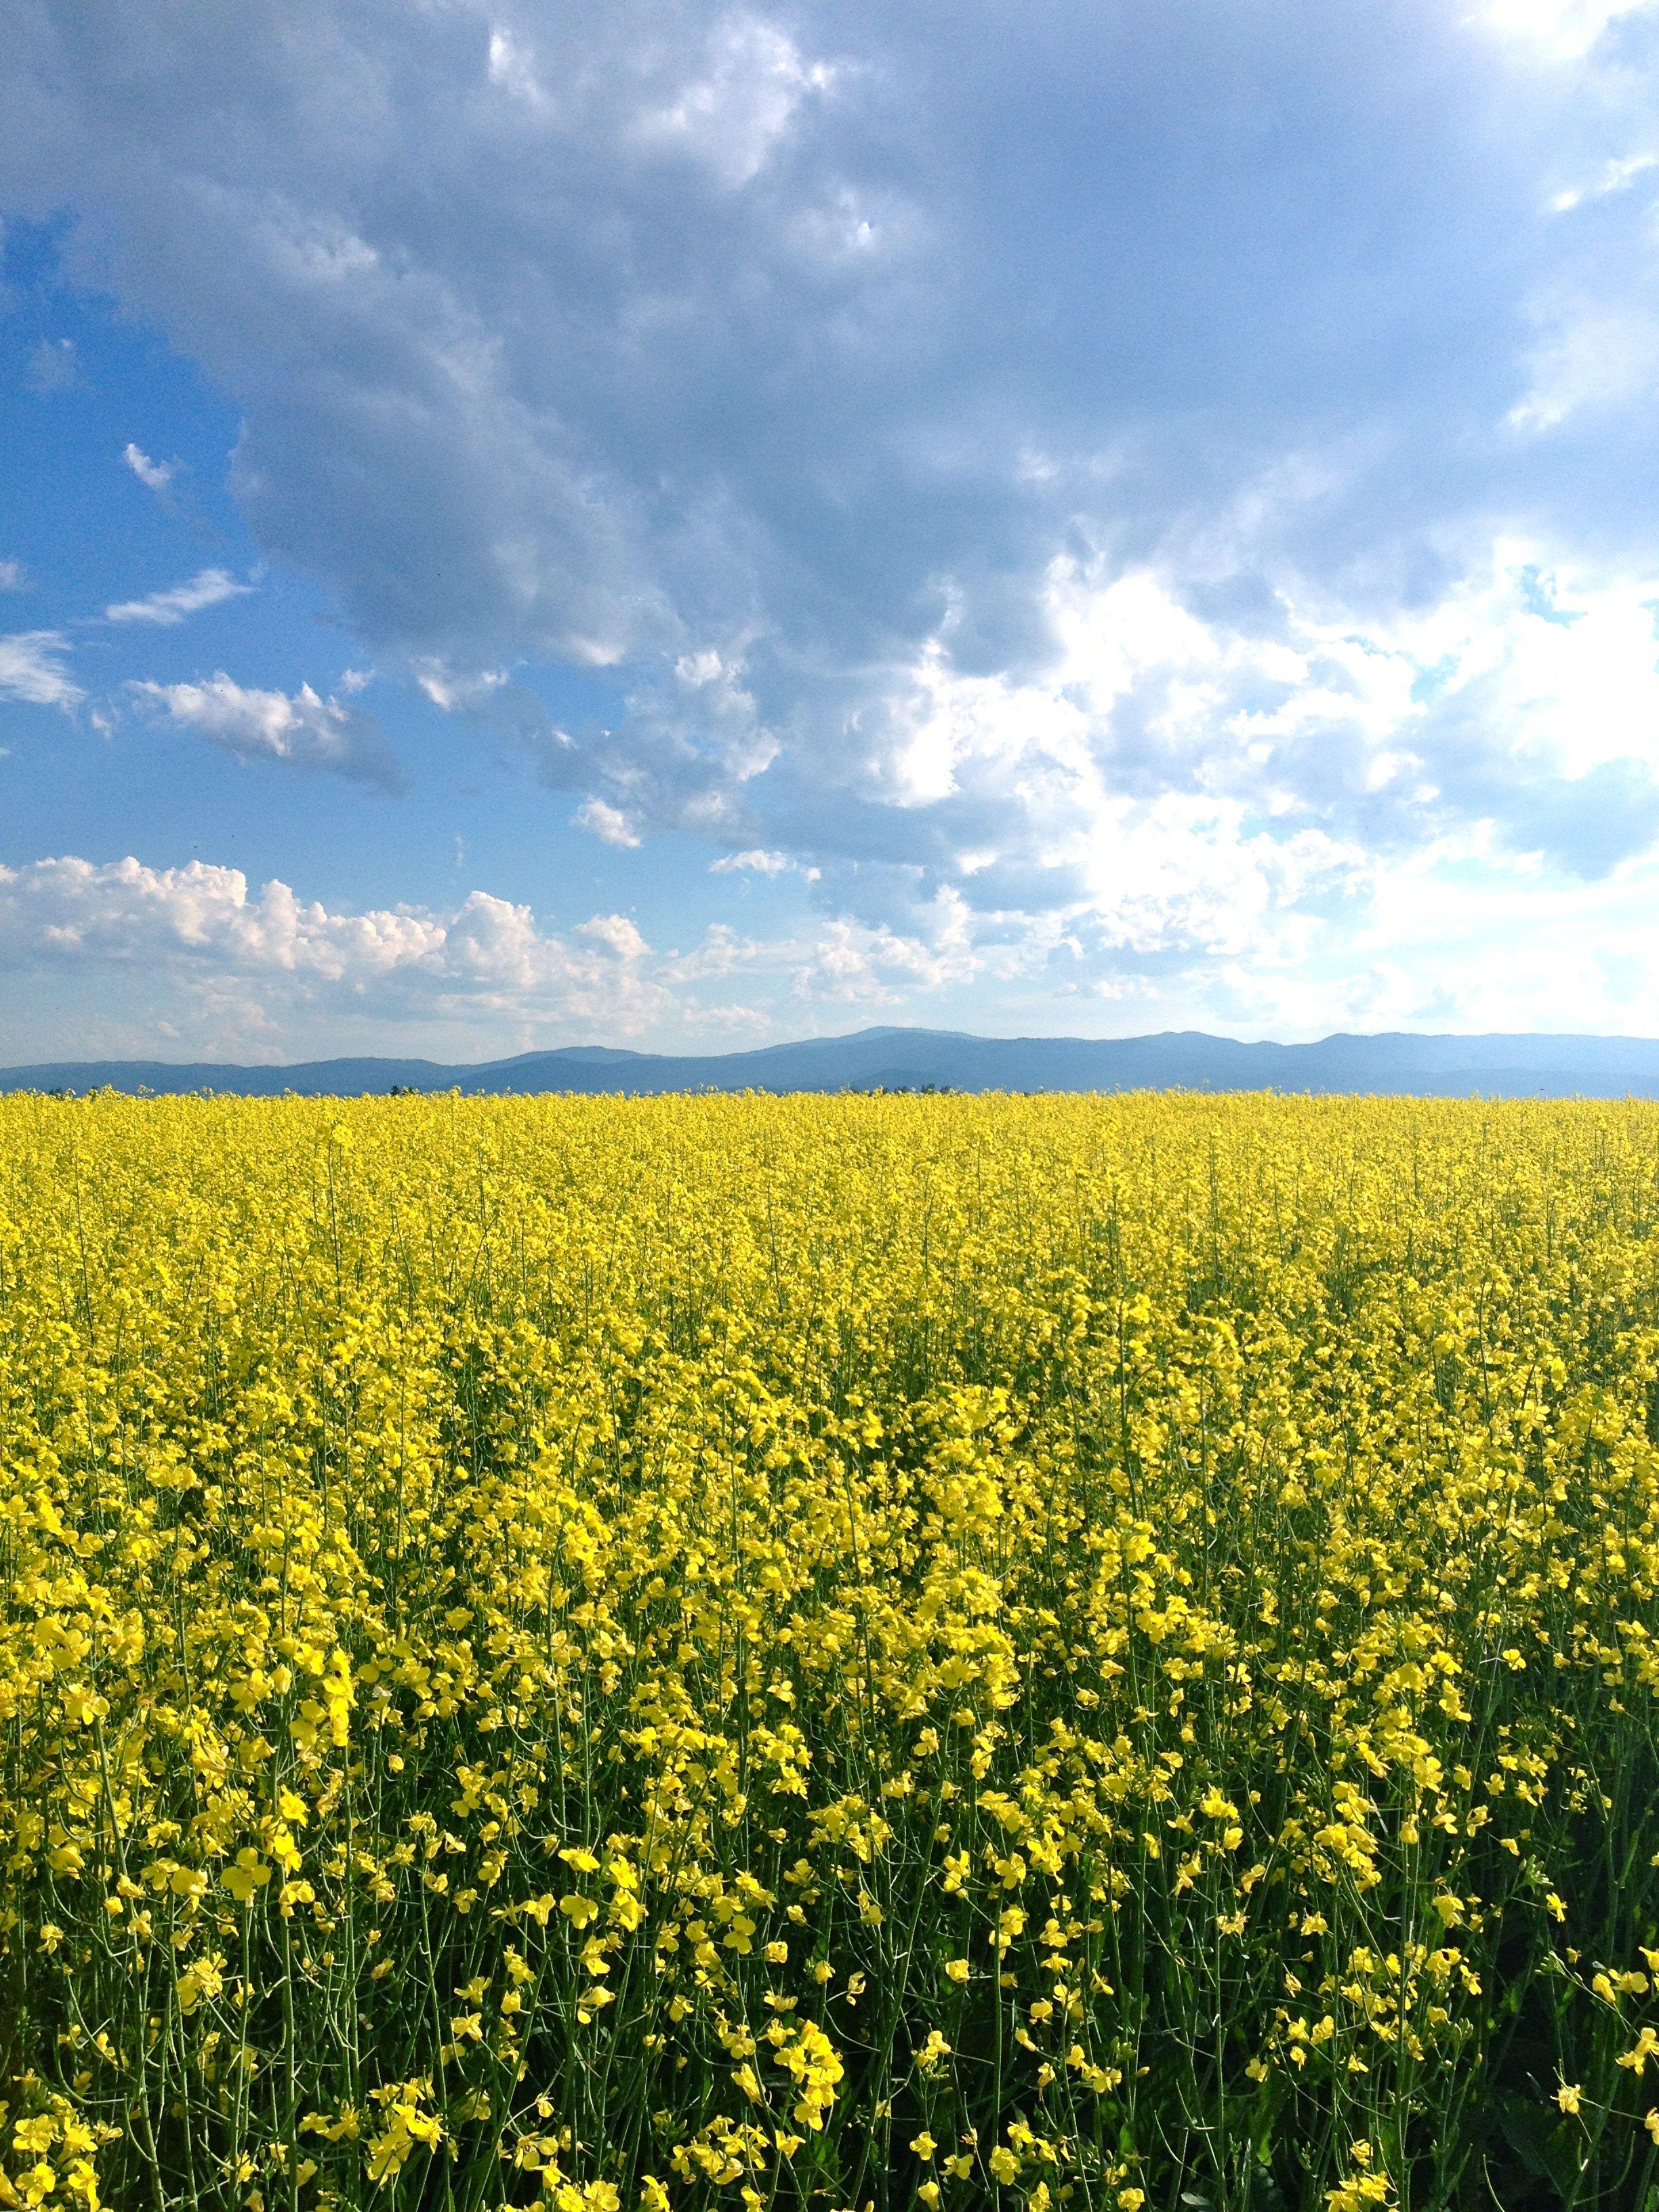 Canola fields in Northwestern Montana